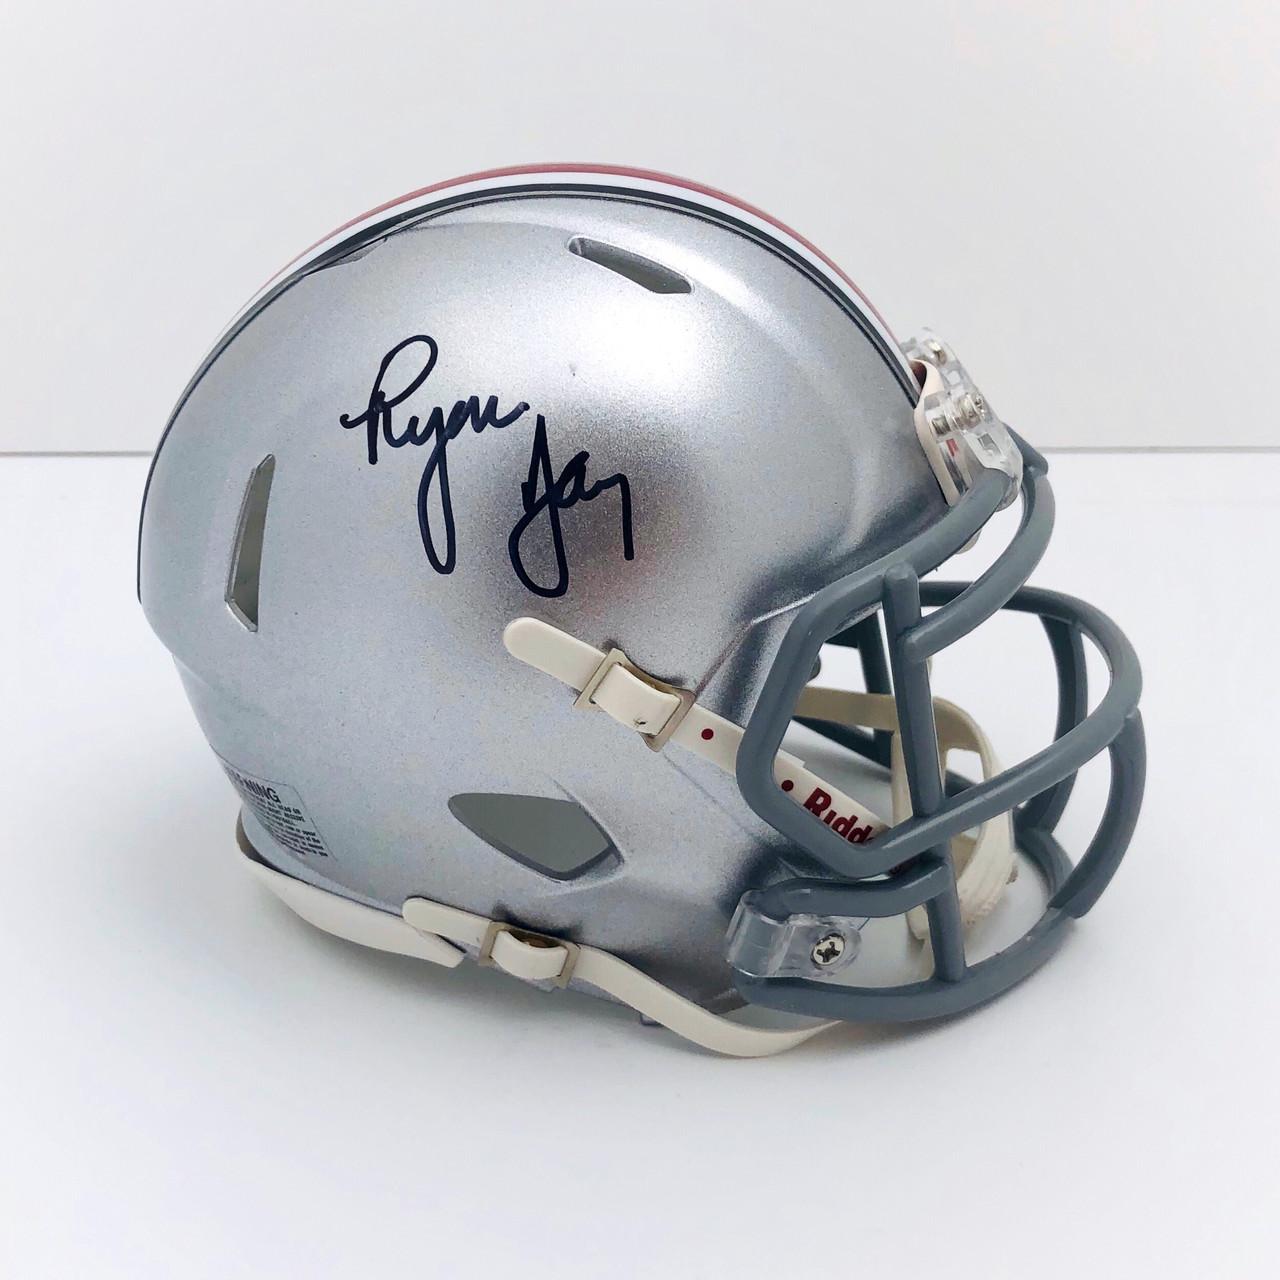 Ryan Day Ohio State Buckeyes Autographed Mini Helmet - Certified Authentic